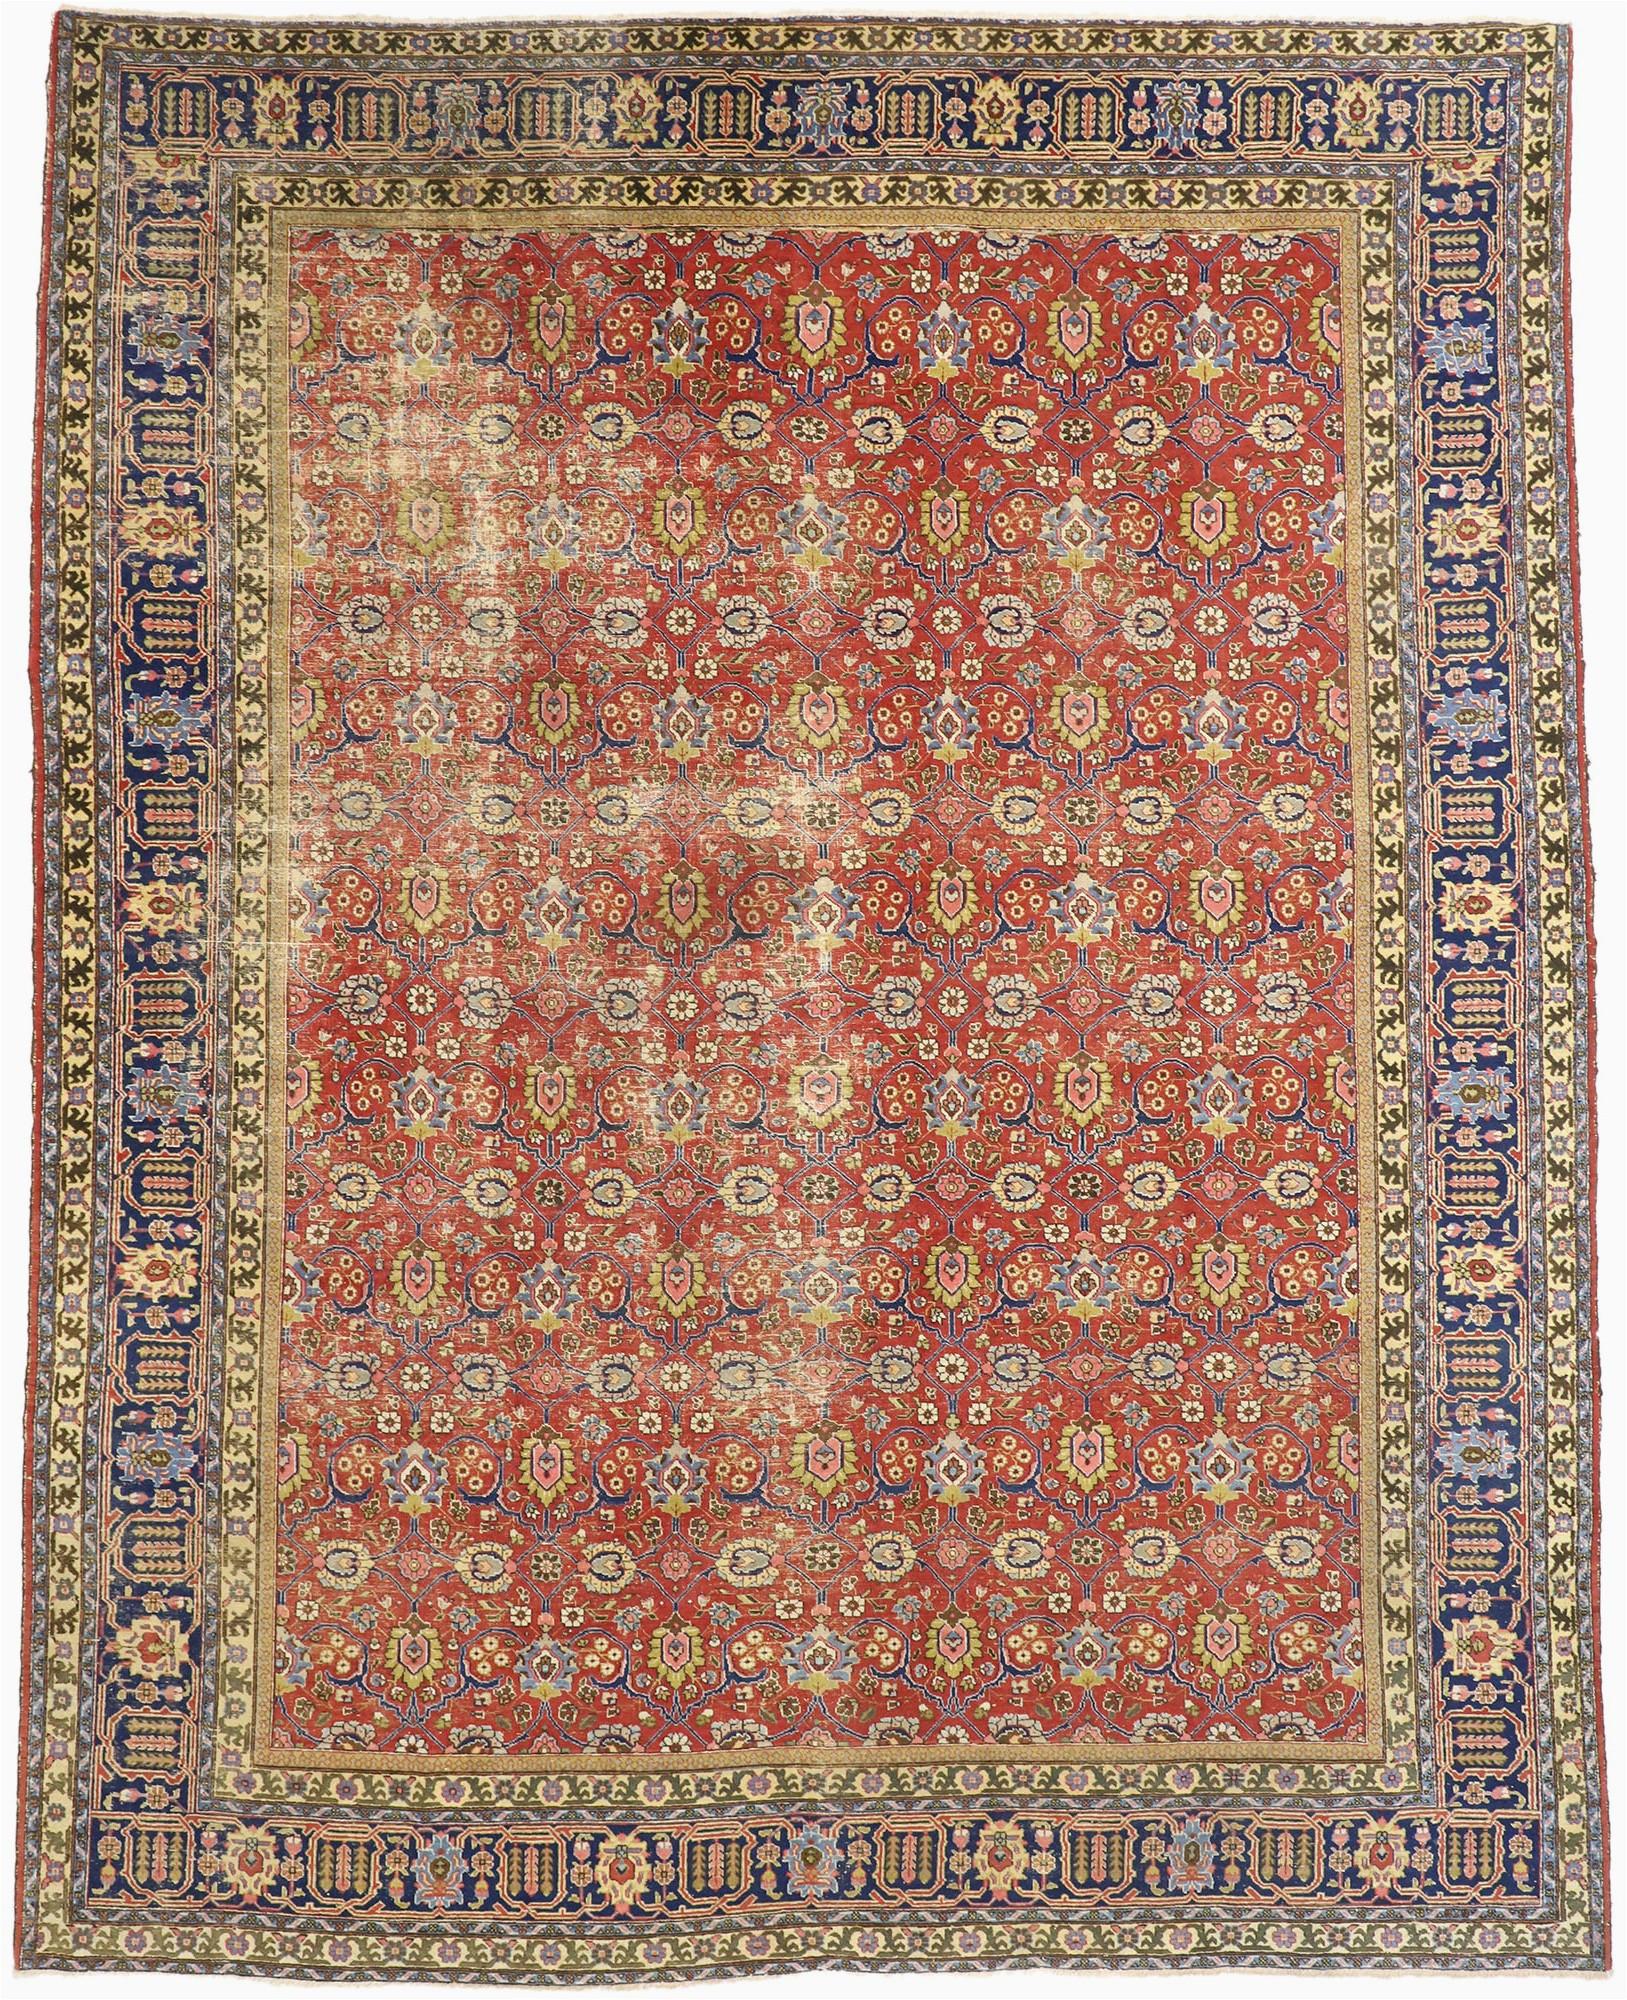 12 x 15 antique tabriz rug